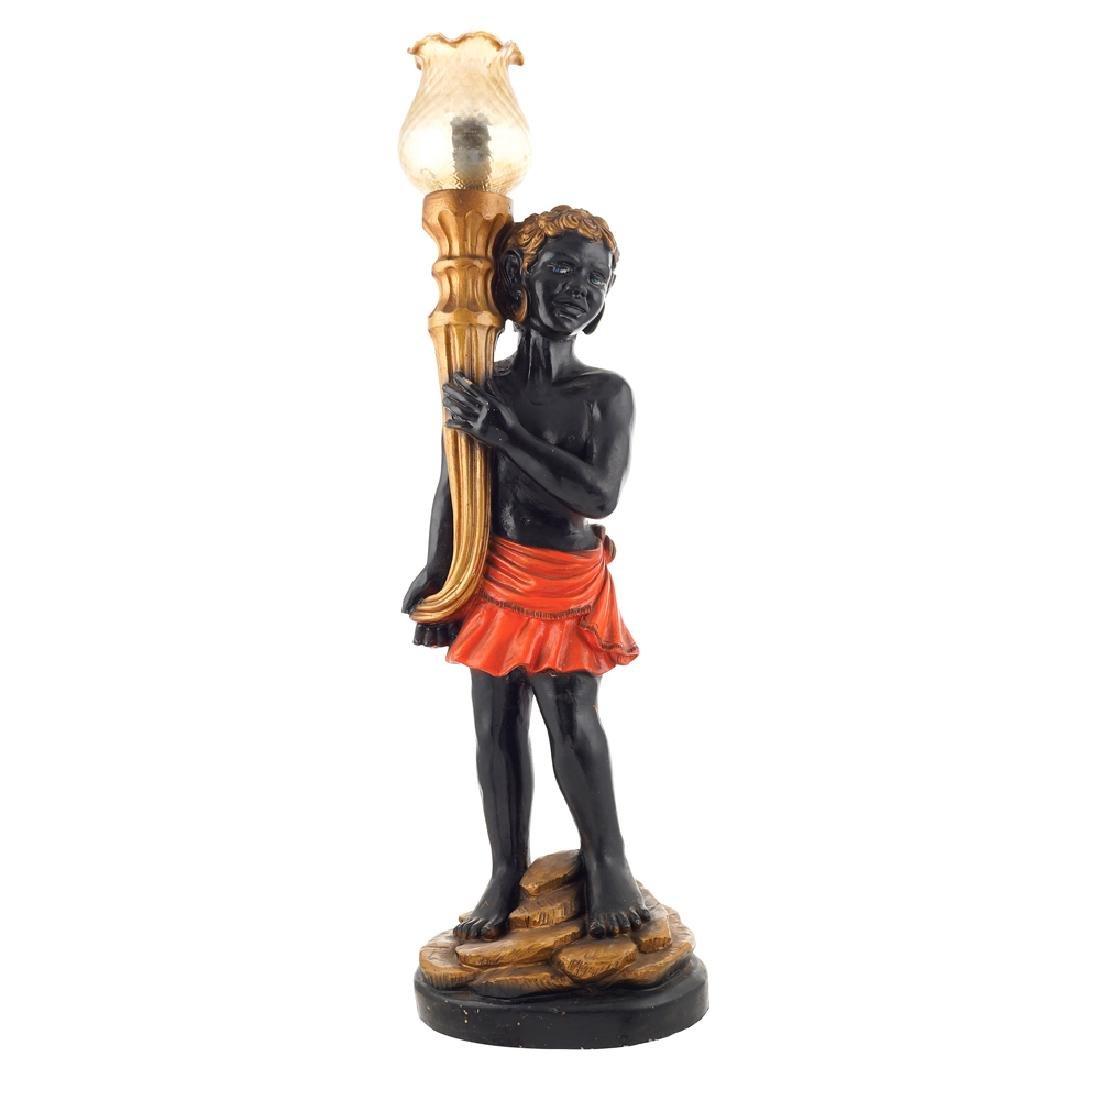 Polychrome wooden lamp France 20th century h. 70 cm.